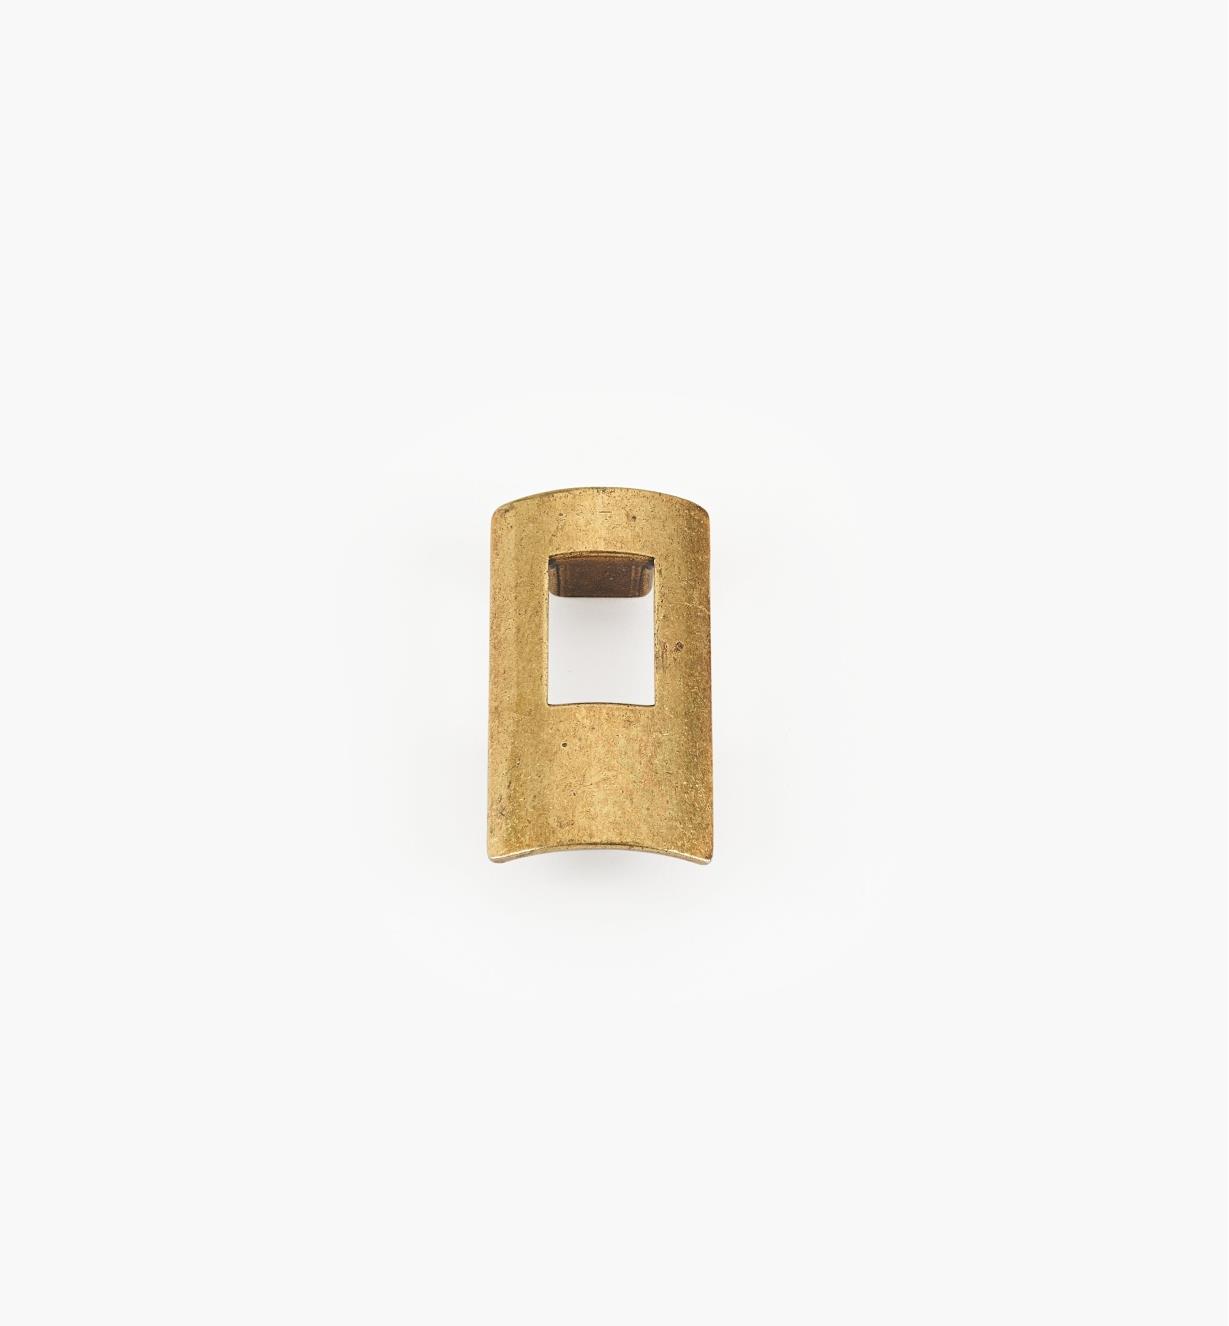 01G1921 - 32mm x 60mm Antique Brass Portal Pull